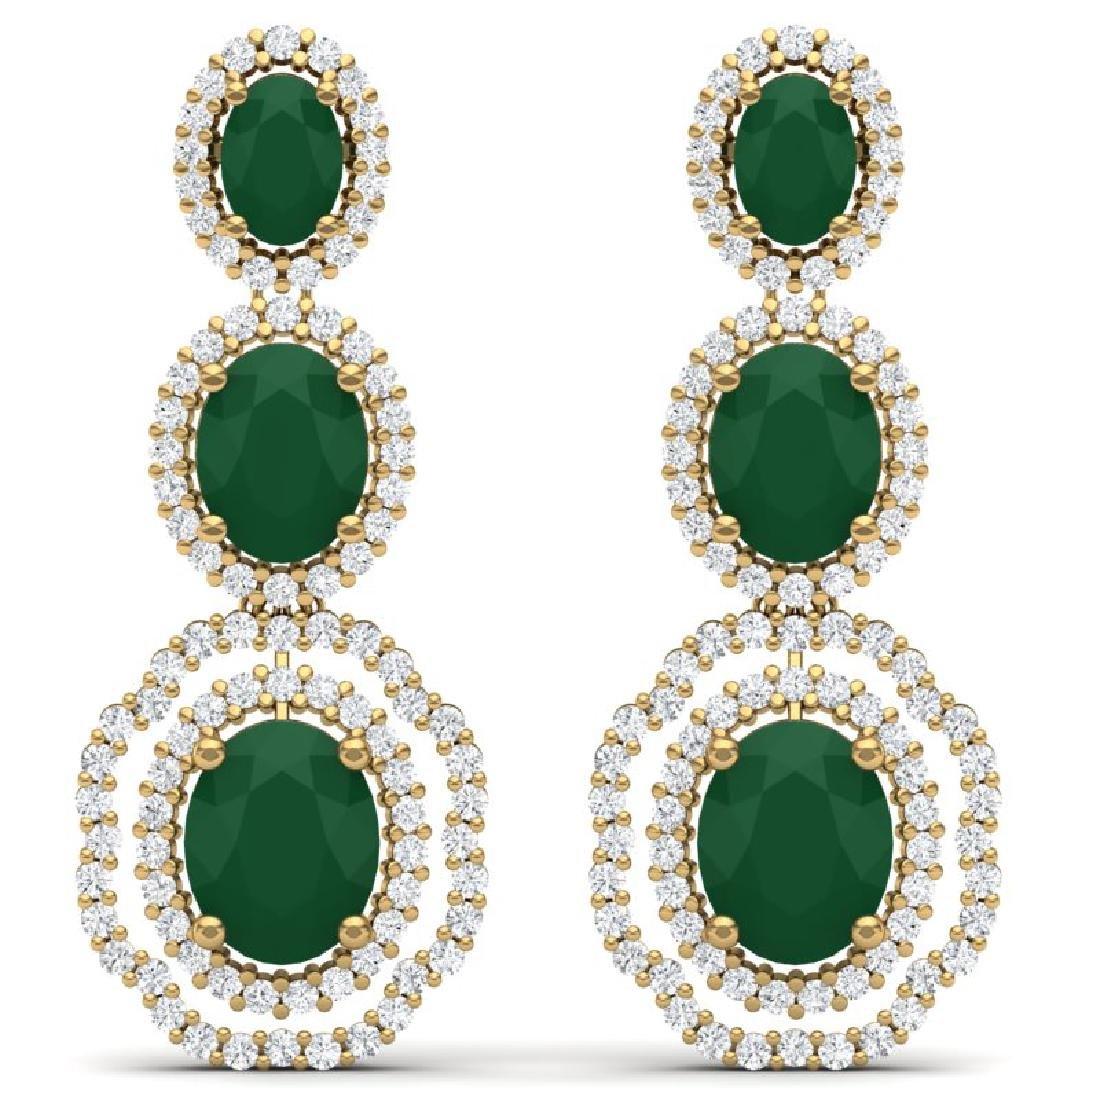 17.01 CTW Royalty Emerald & VS Diamond Earrings 18K